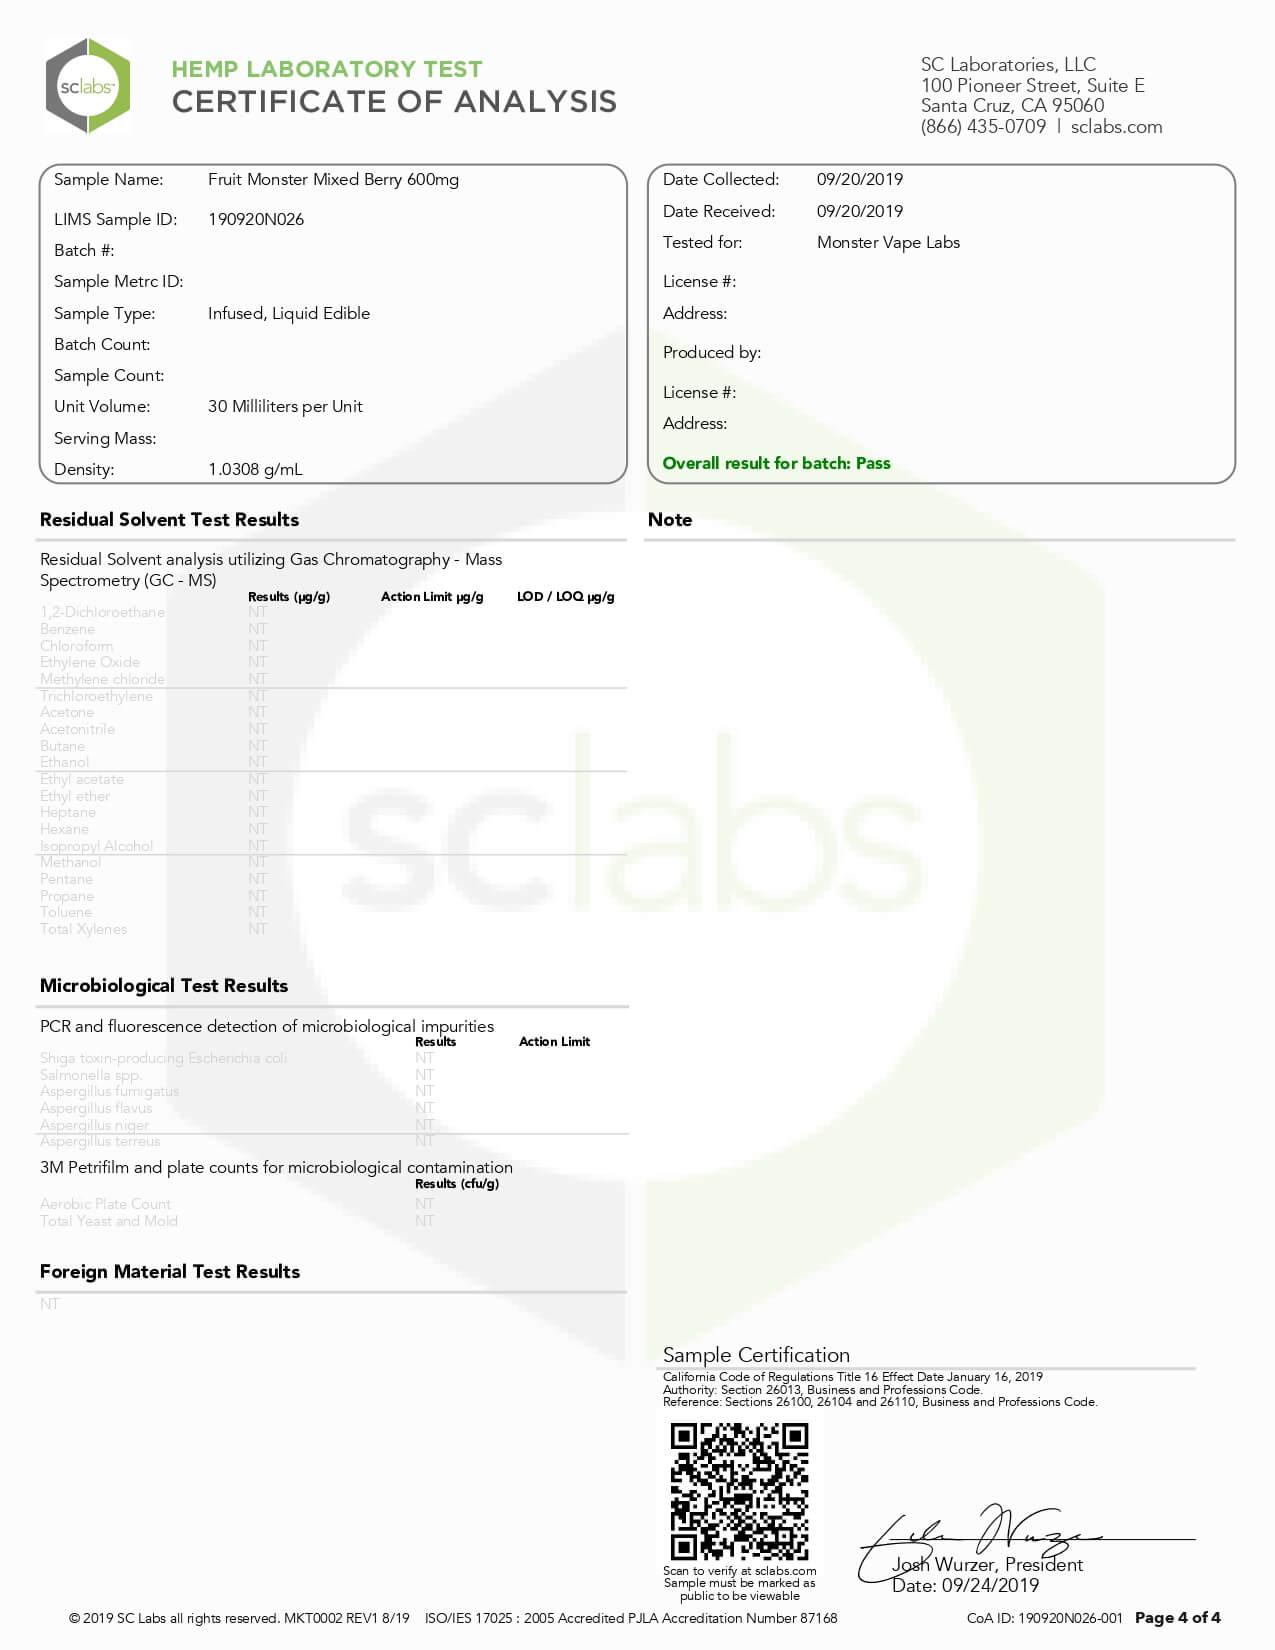 Fruit Monster CBD Vape Mixed Berry 600mg Lab Report